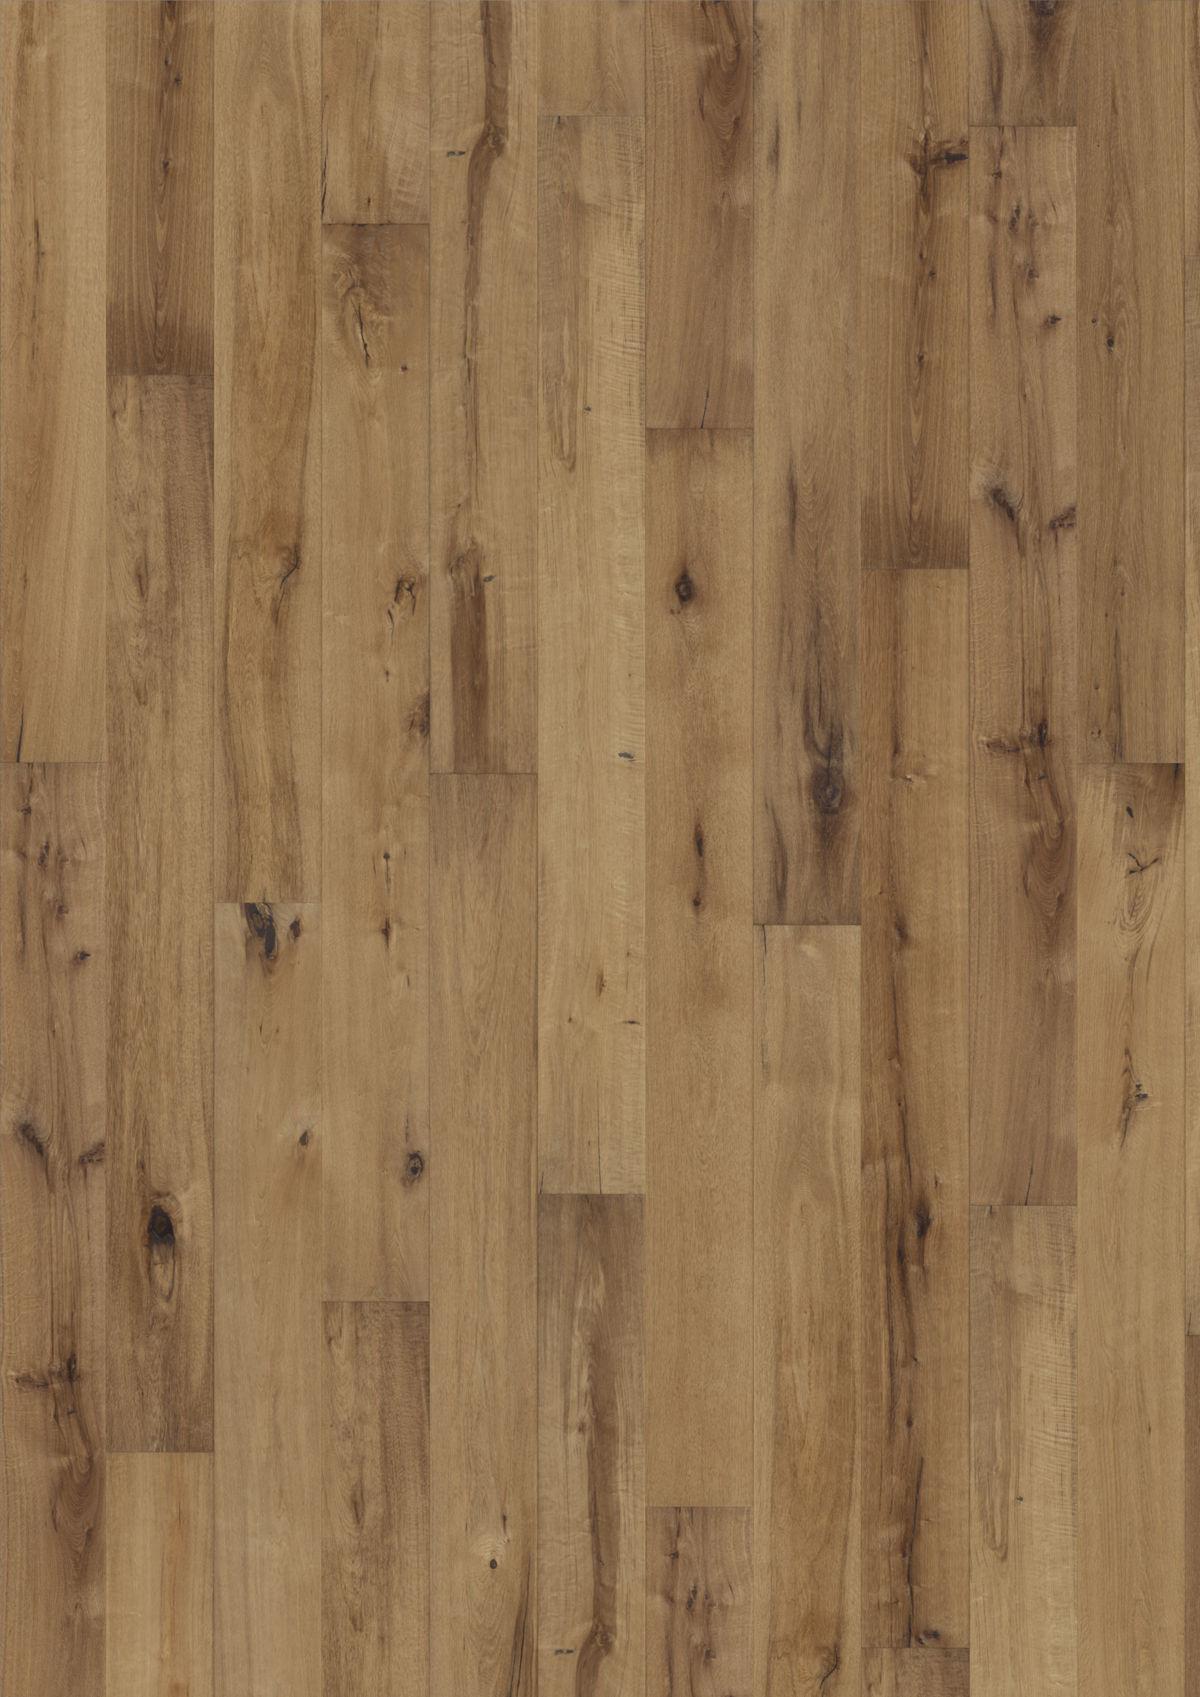 Engineered Wood Flooring Manufacturers